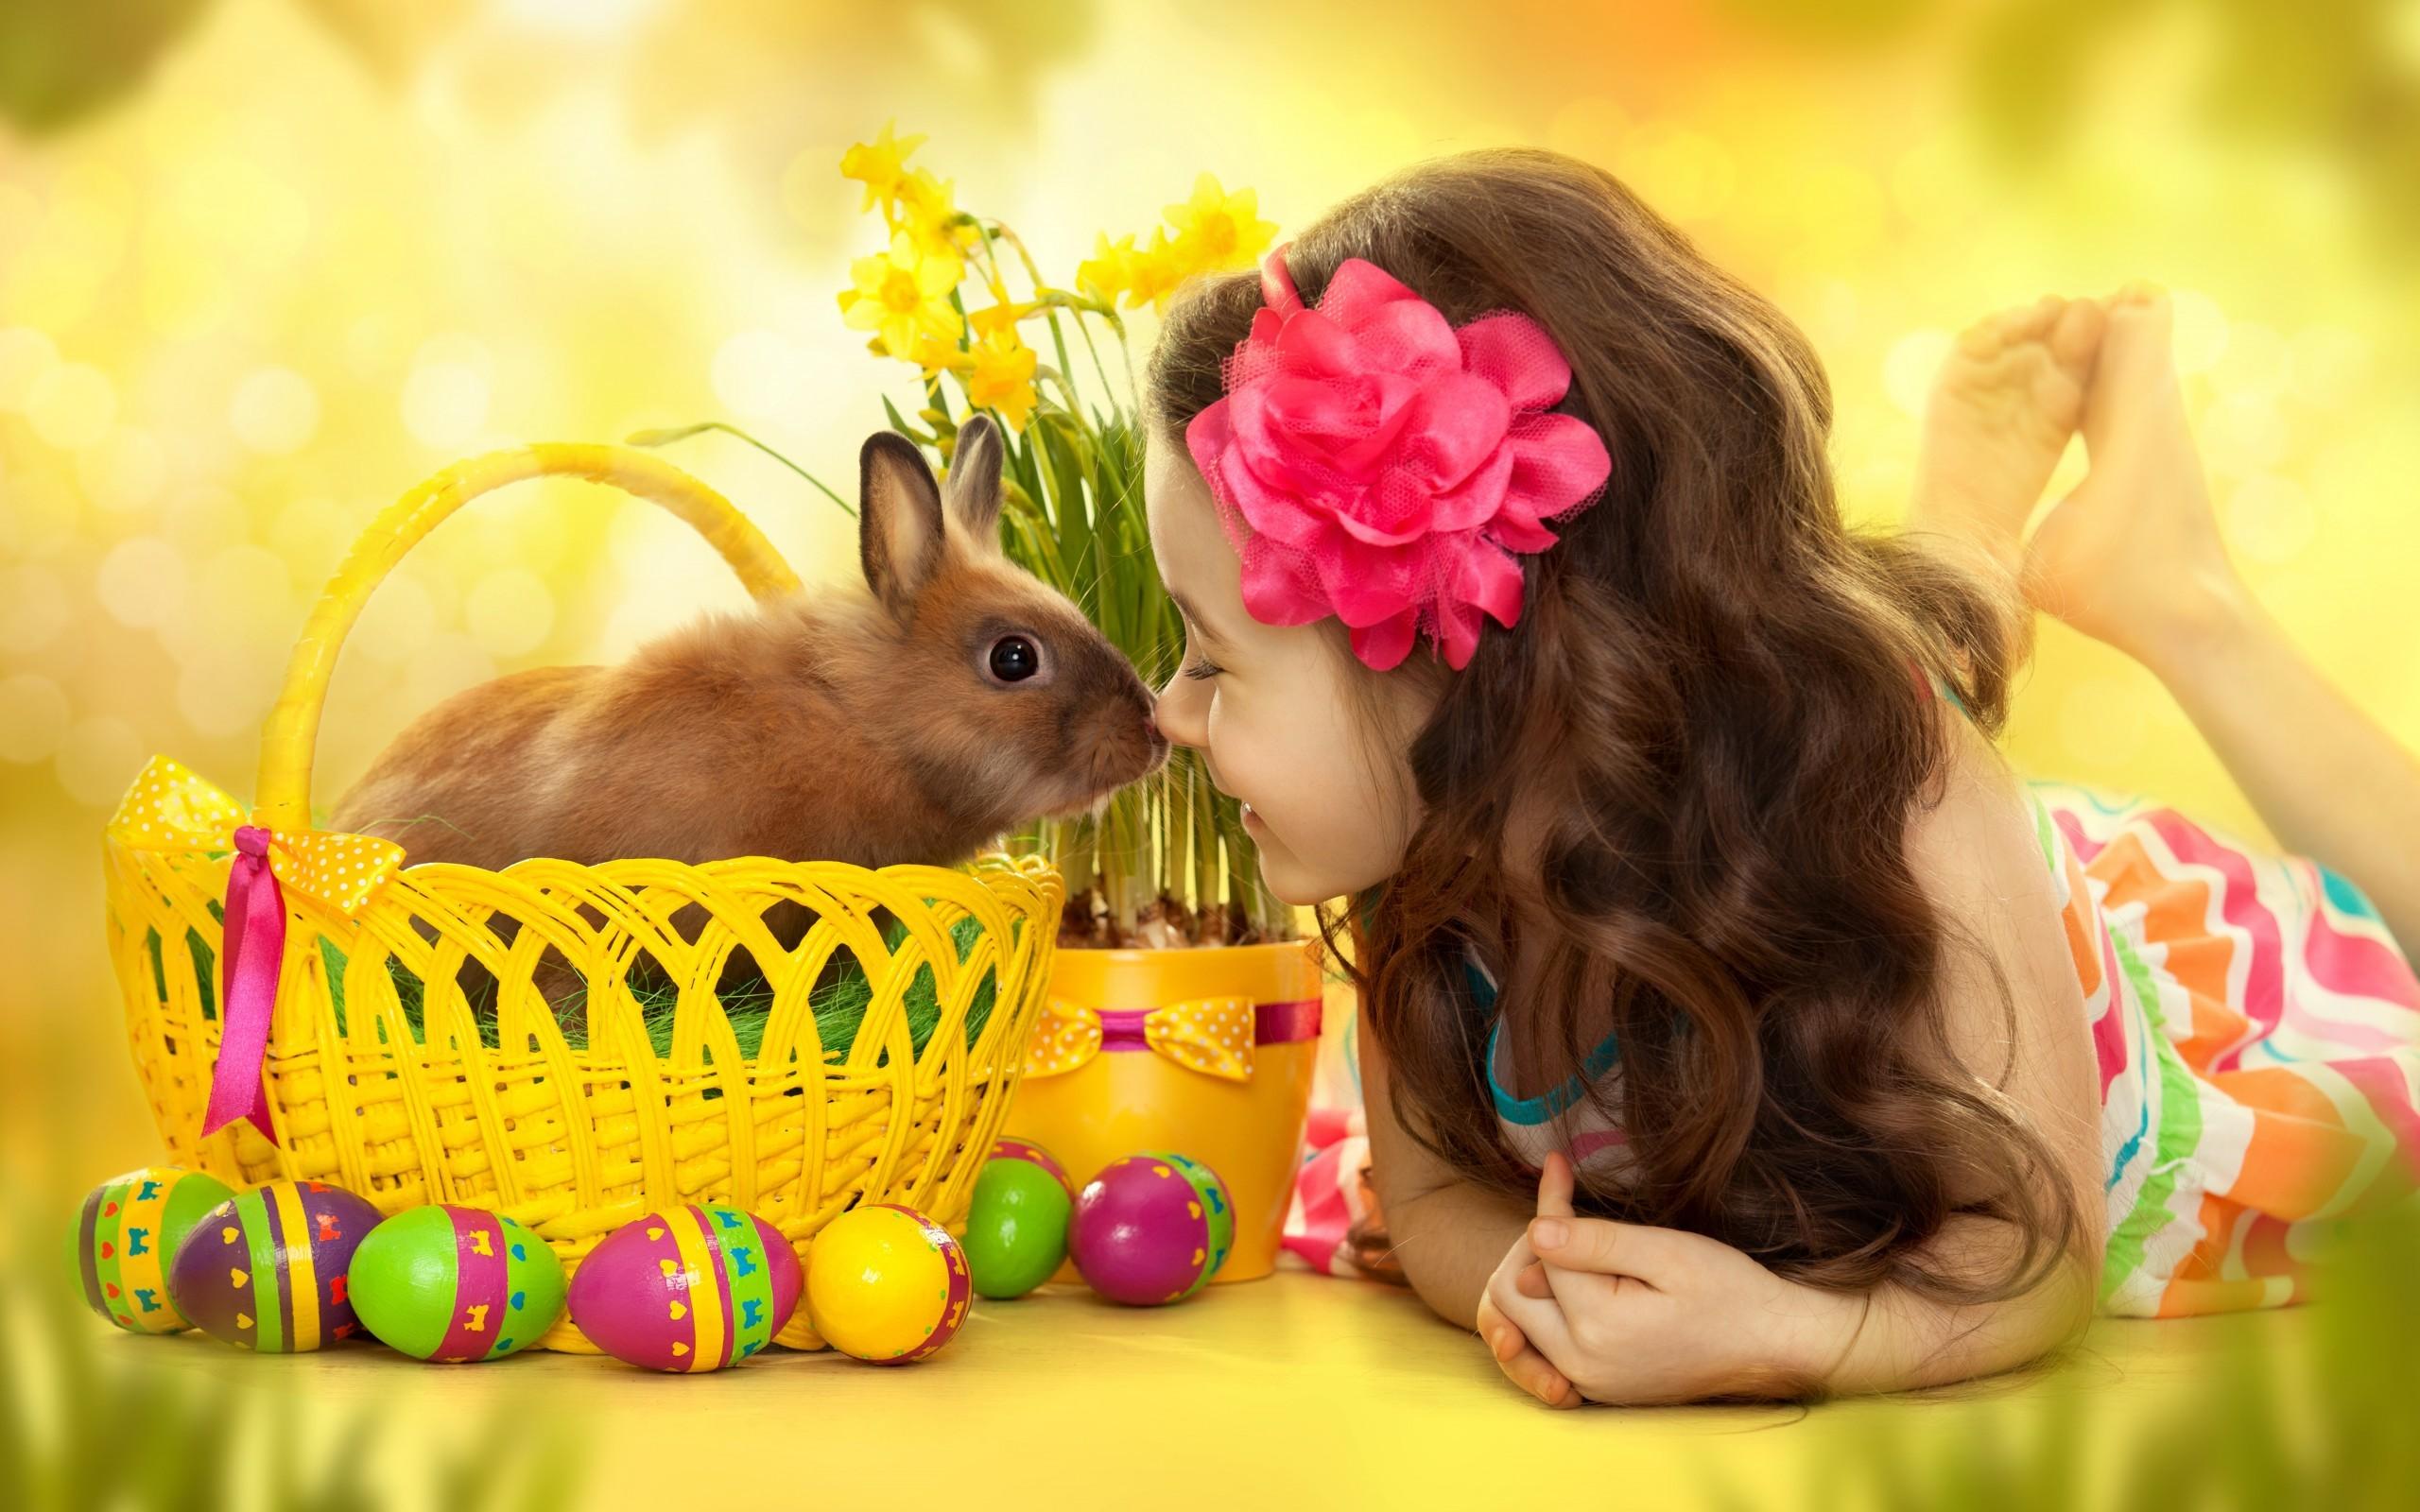 Holiday – Easter Holiday Little Girl Bunny Basket Easter Egg Flower Cute  Wallpaper